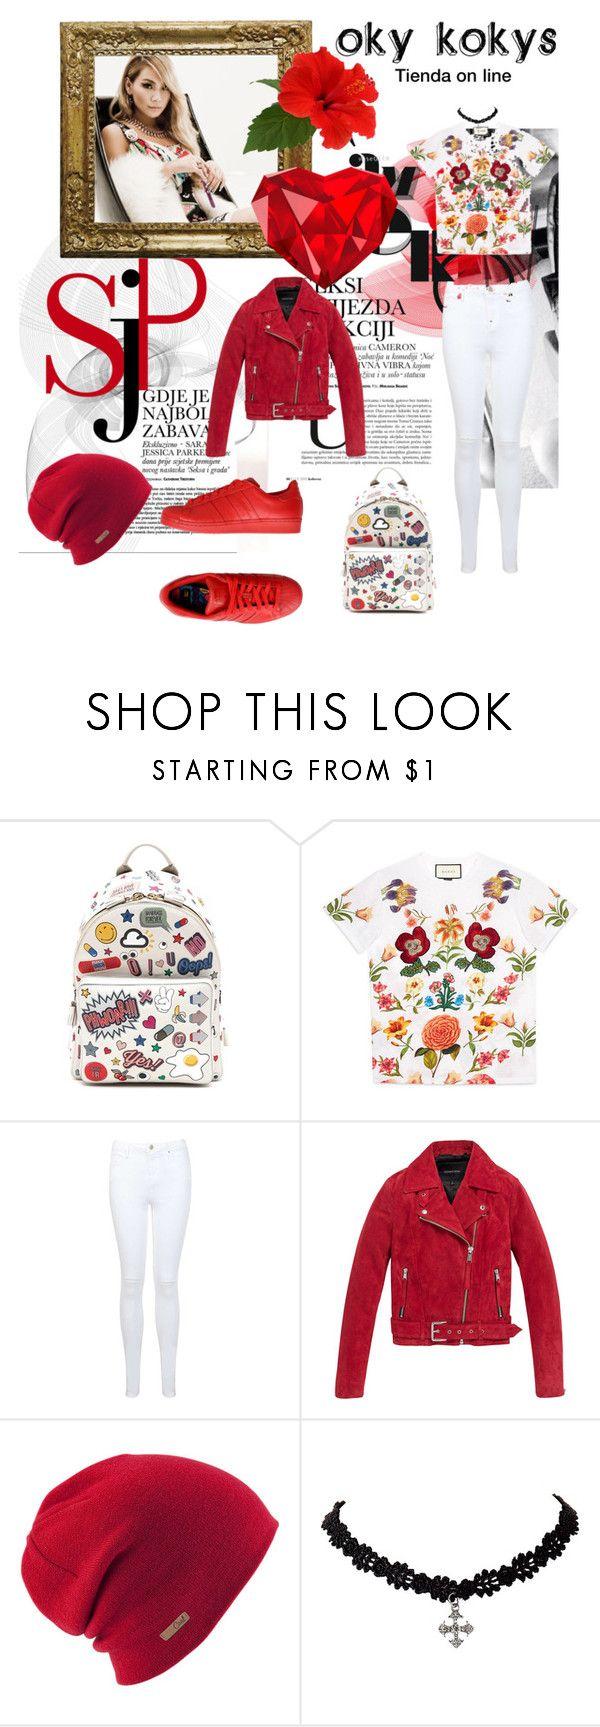 """CL KPOP 2NE1"" by anna-lauren on Polyvore featuring moda, Braun, adidas Originals, Anya Hindmarch, Gucci, Miss Selfridge, Andrew Marc, Coal, kpop y 2NE1"